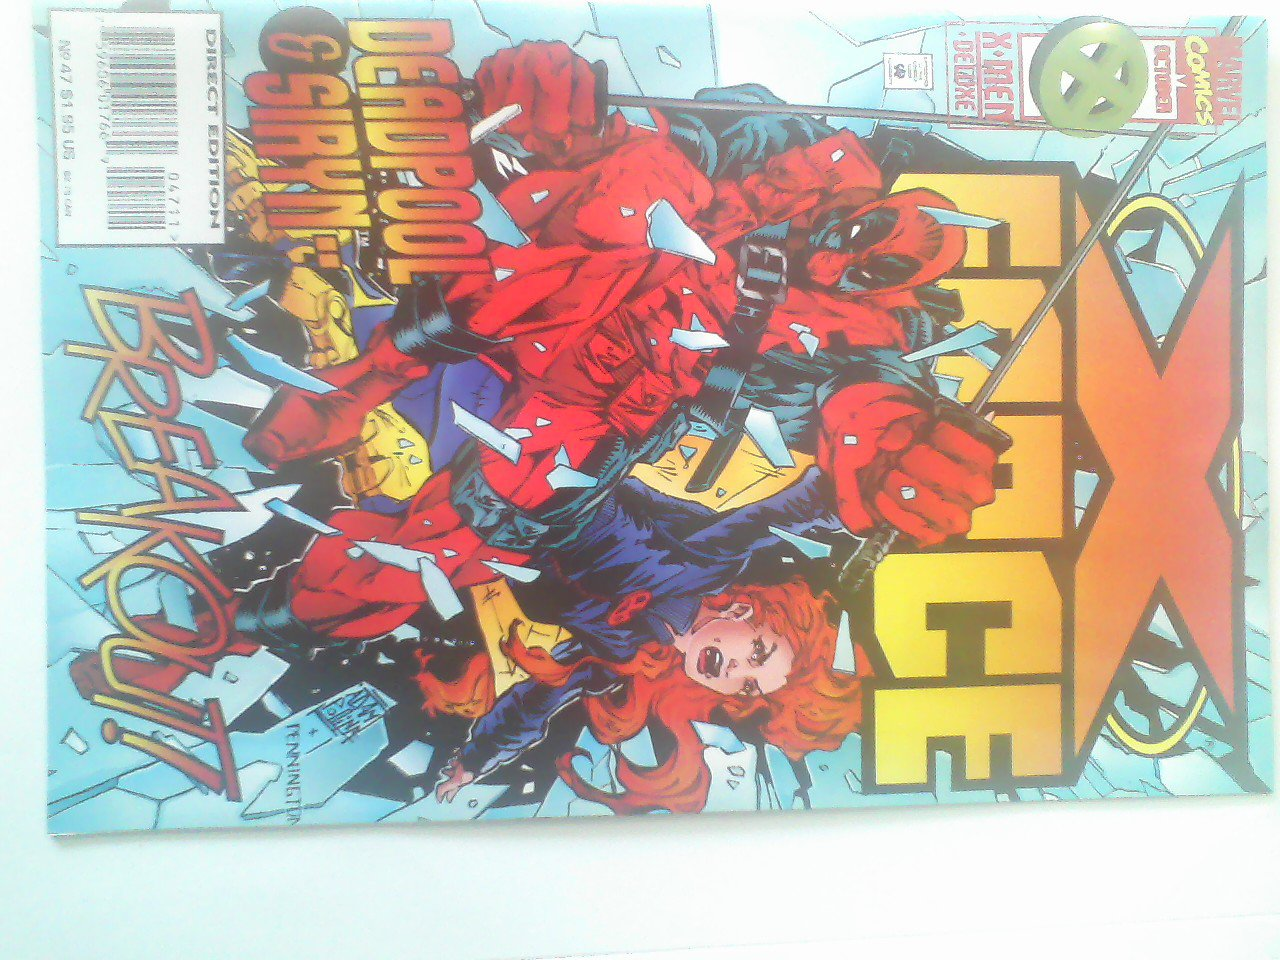 X-force #47 w/card